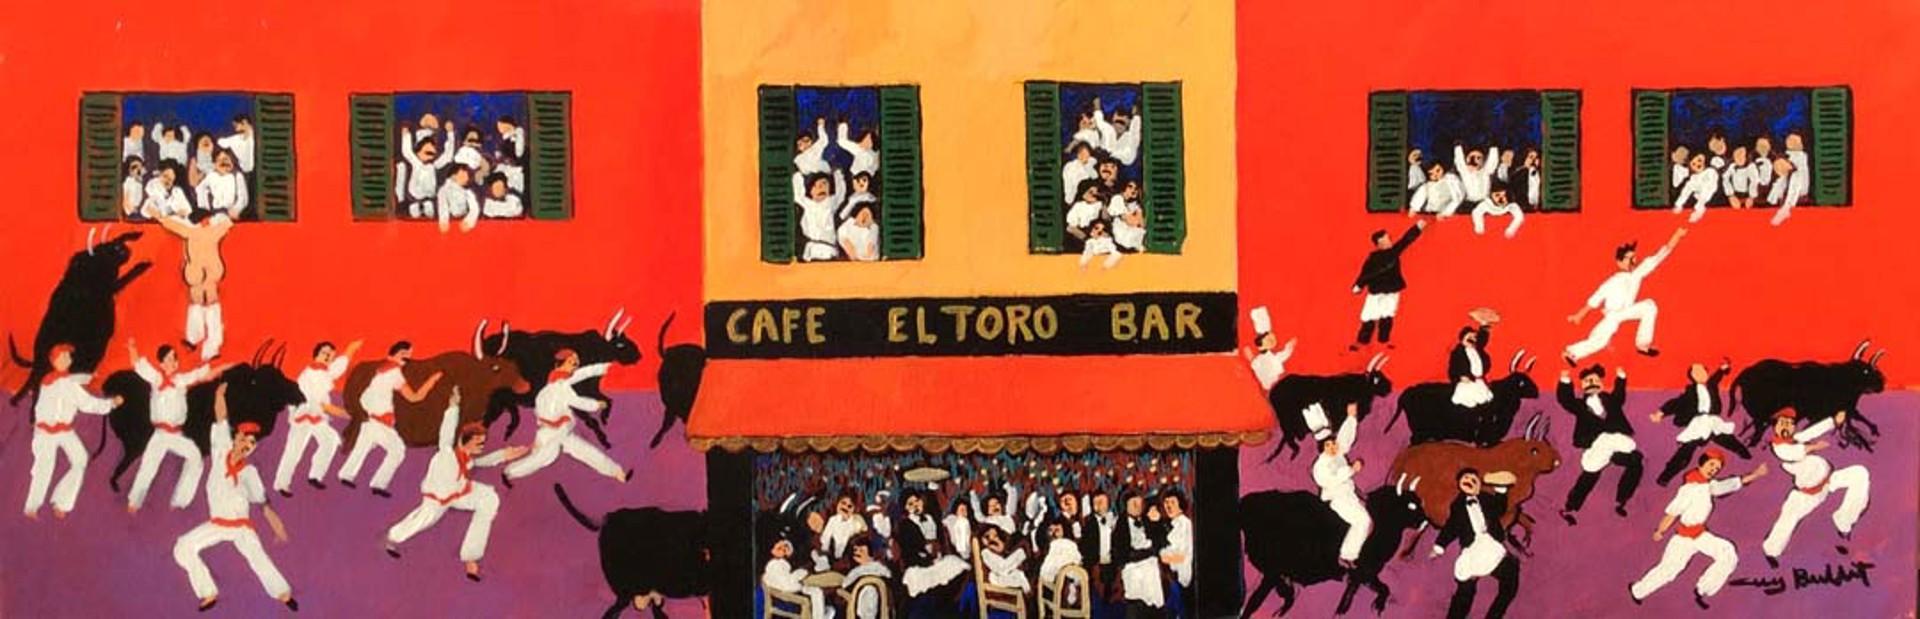 Pamplona - Cafe El Toro by Guy Buffet